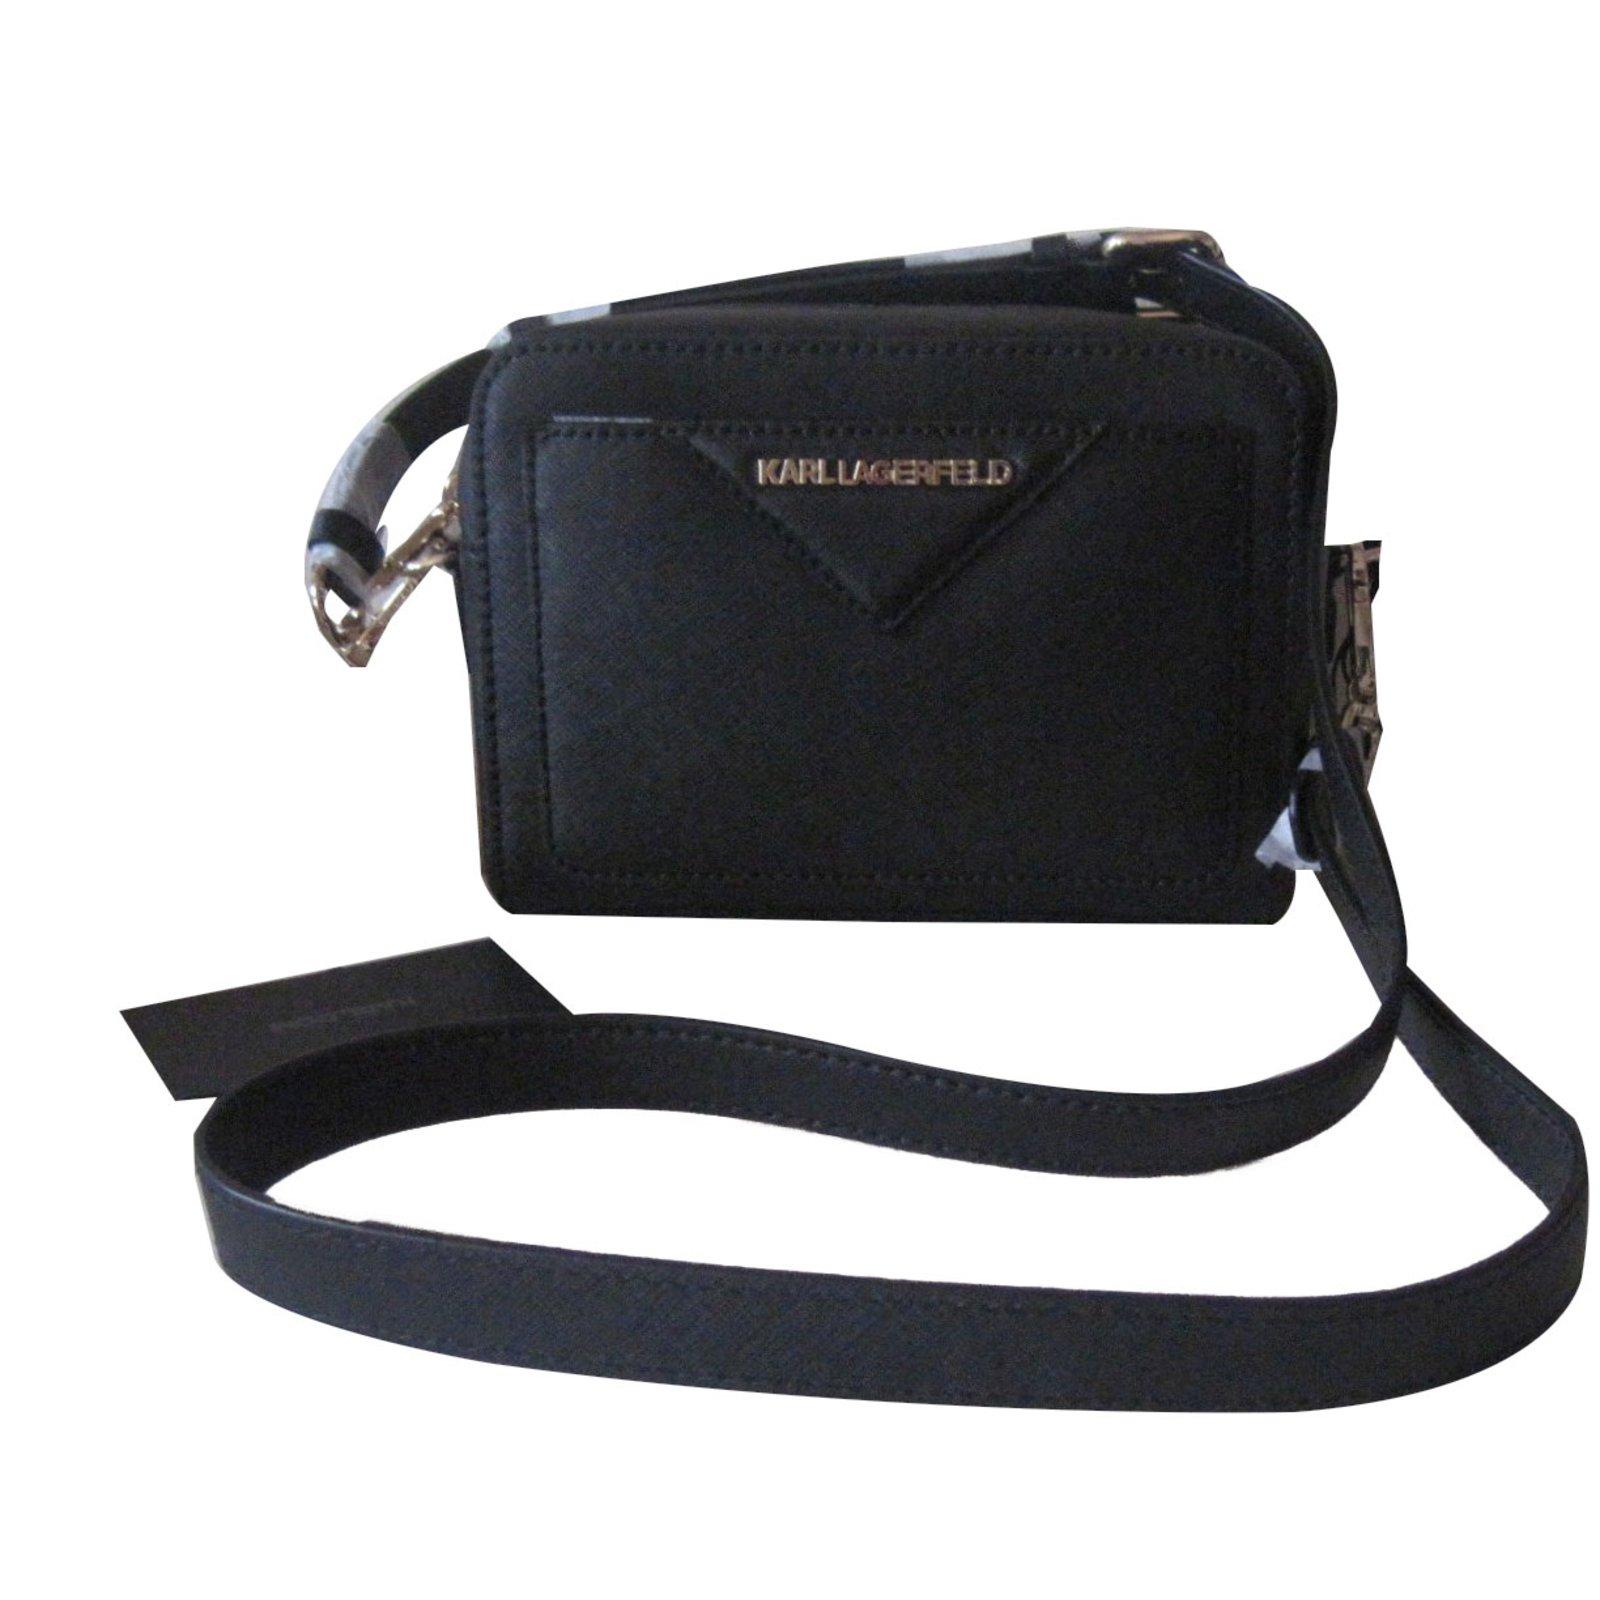 Karl Lagerfeld Handbags Leather Black Ref 65332